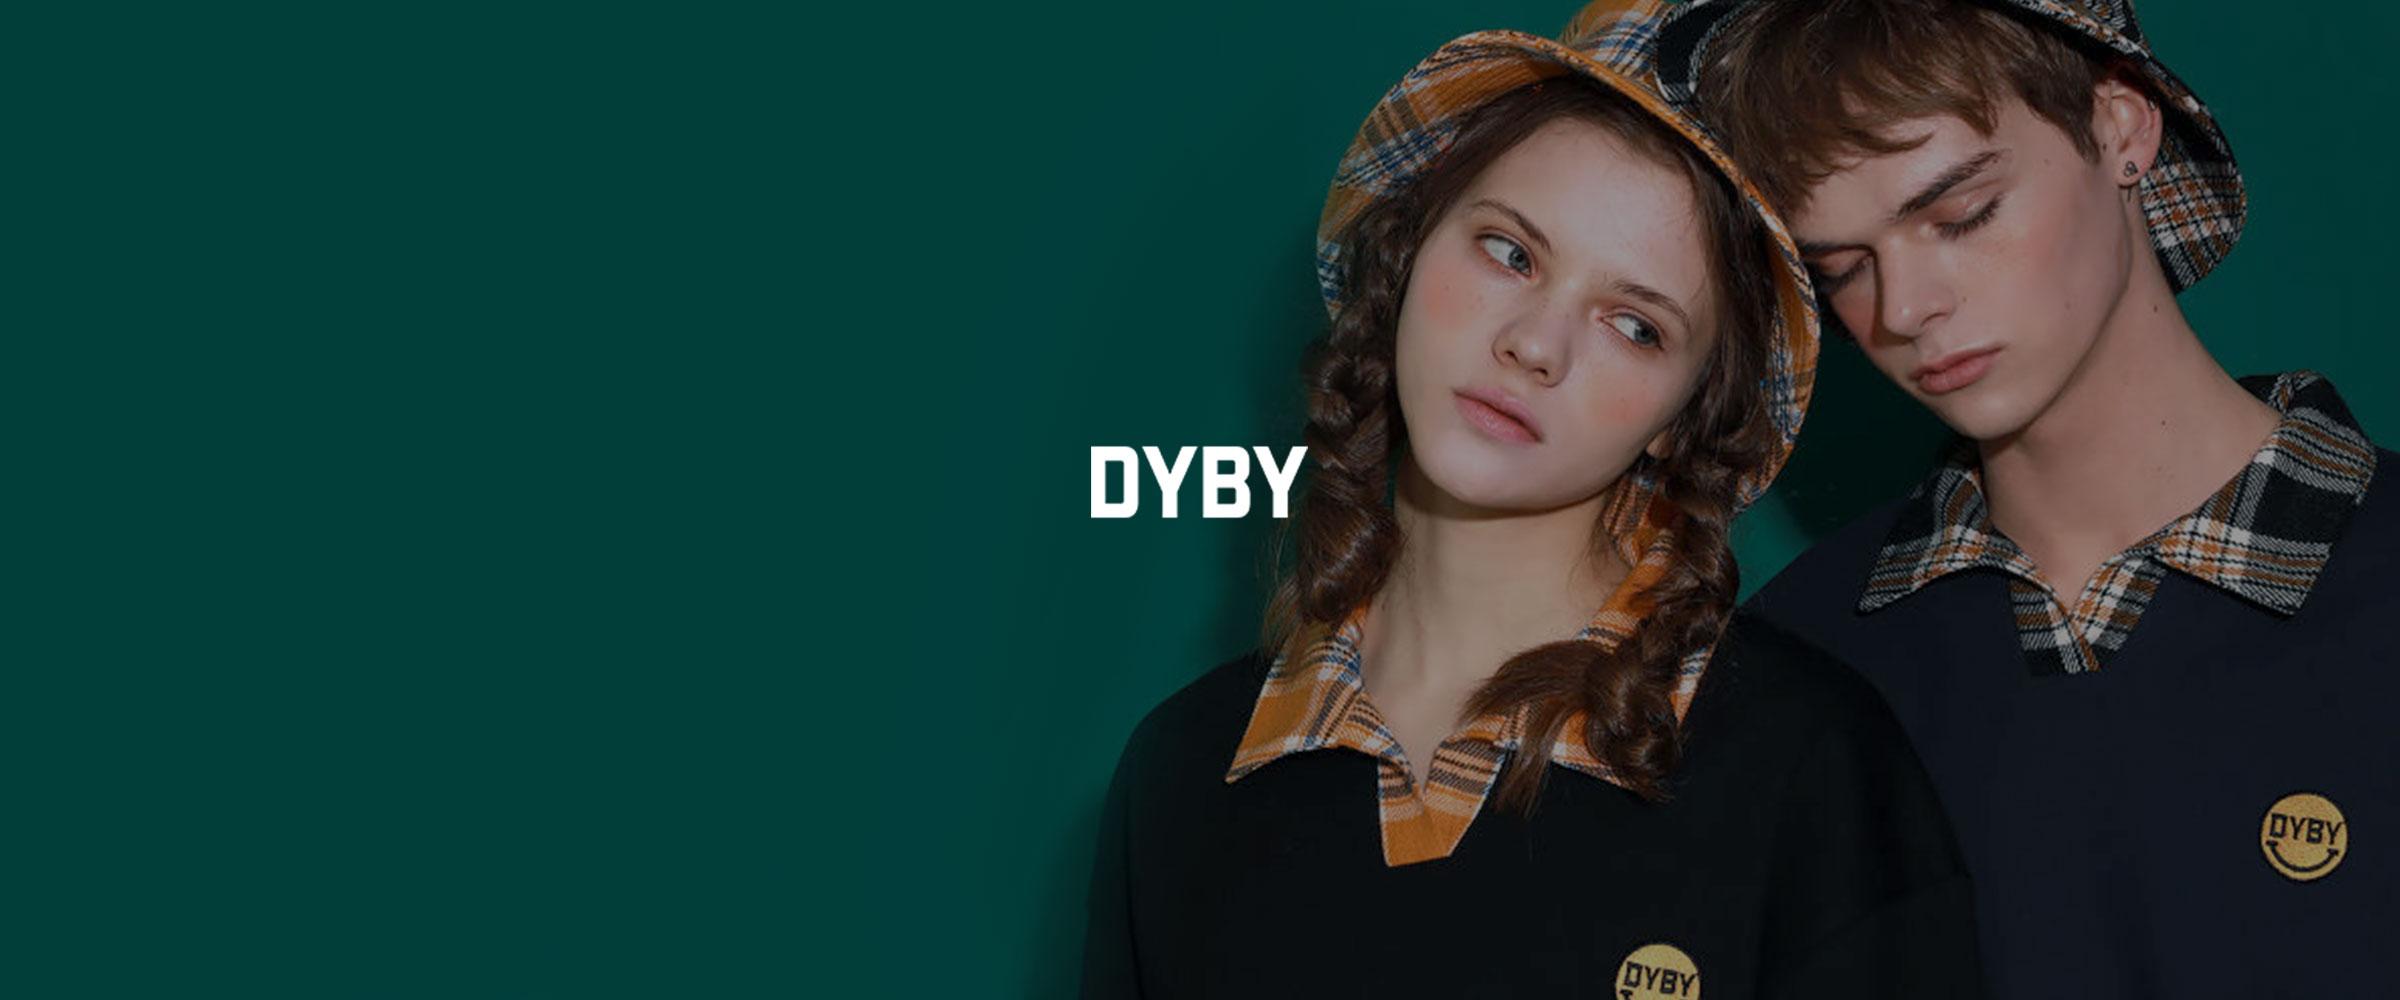 dyby.jpg